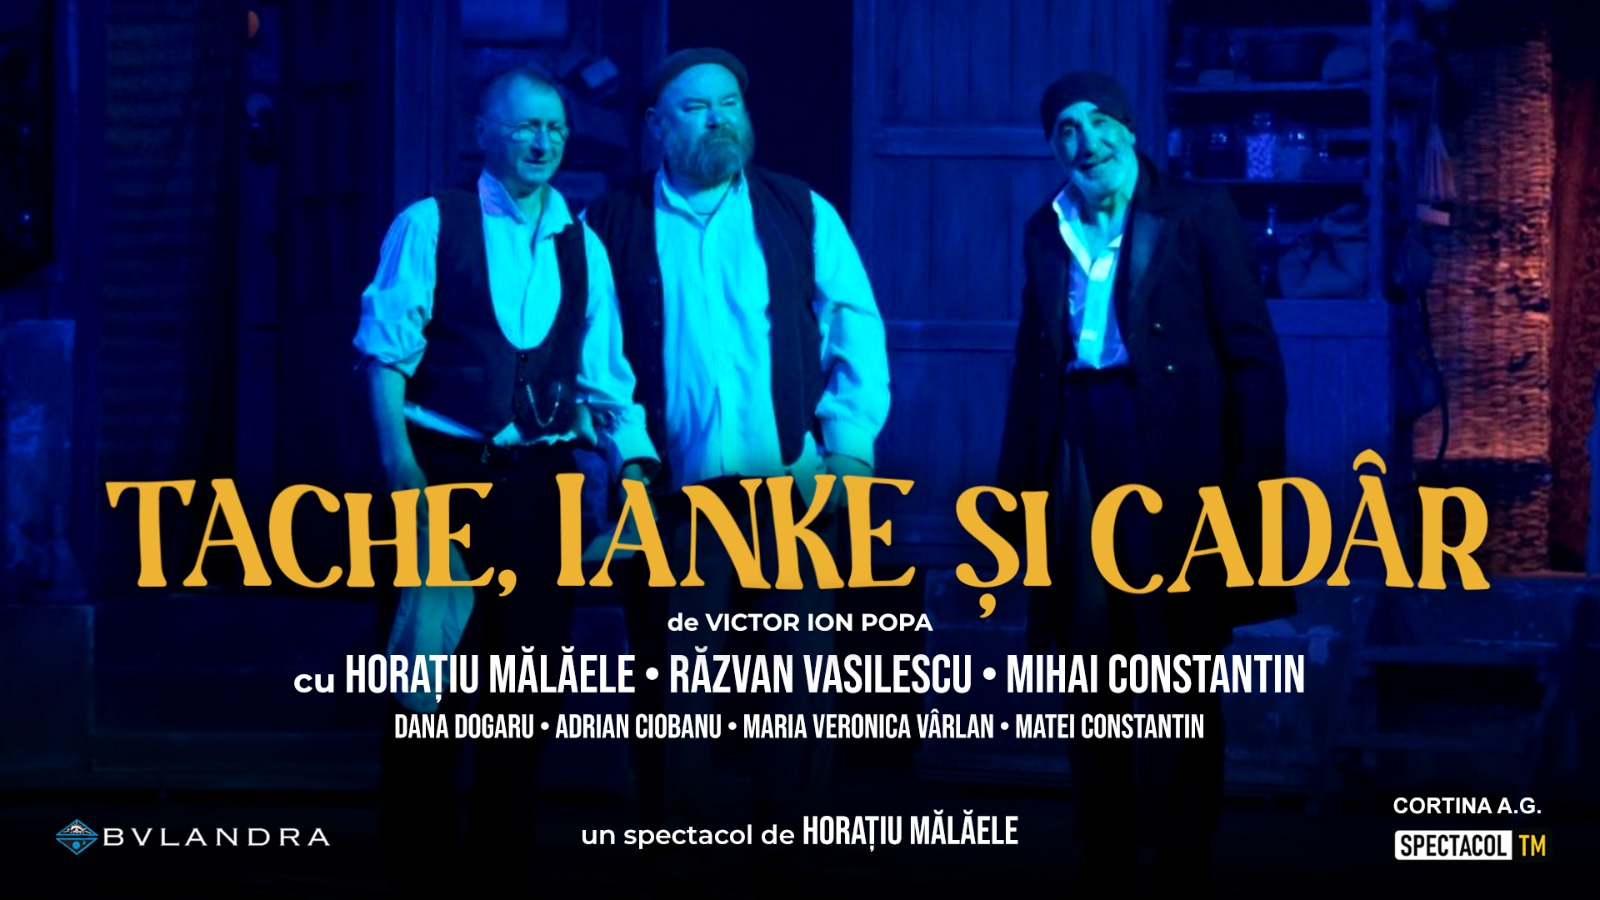 Tache, Ianke și Cadâr